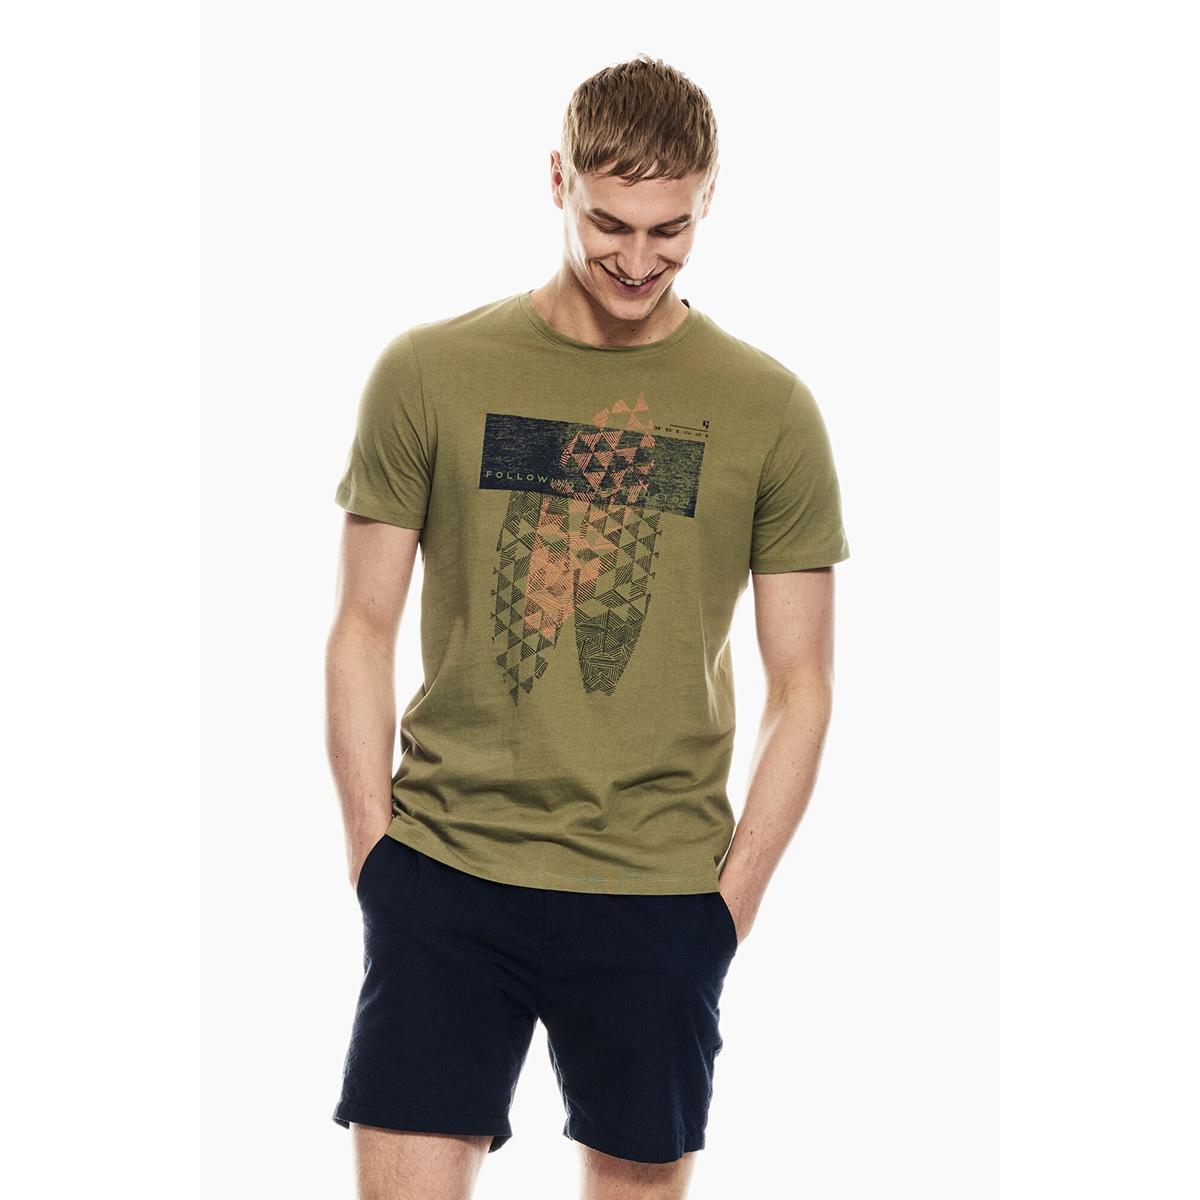 t shirt met opdruk p01201 garcia t-shirt 1805 washed army